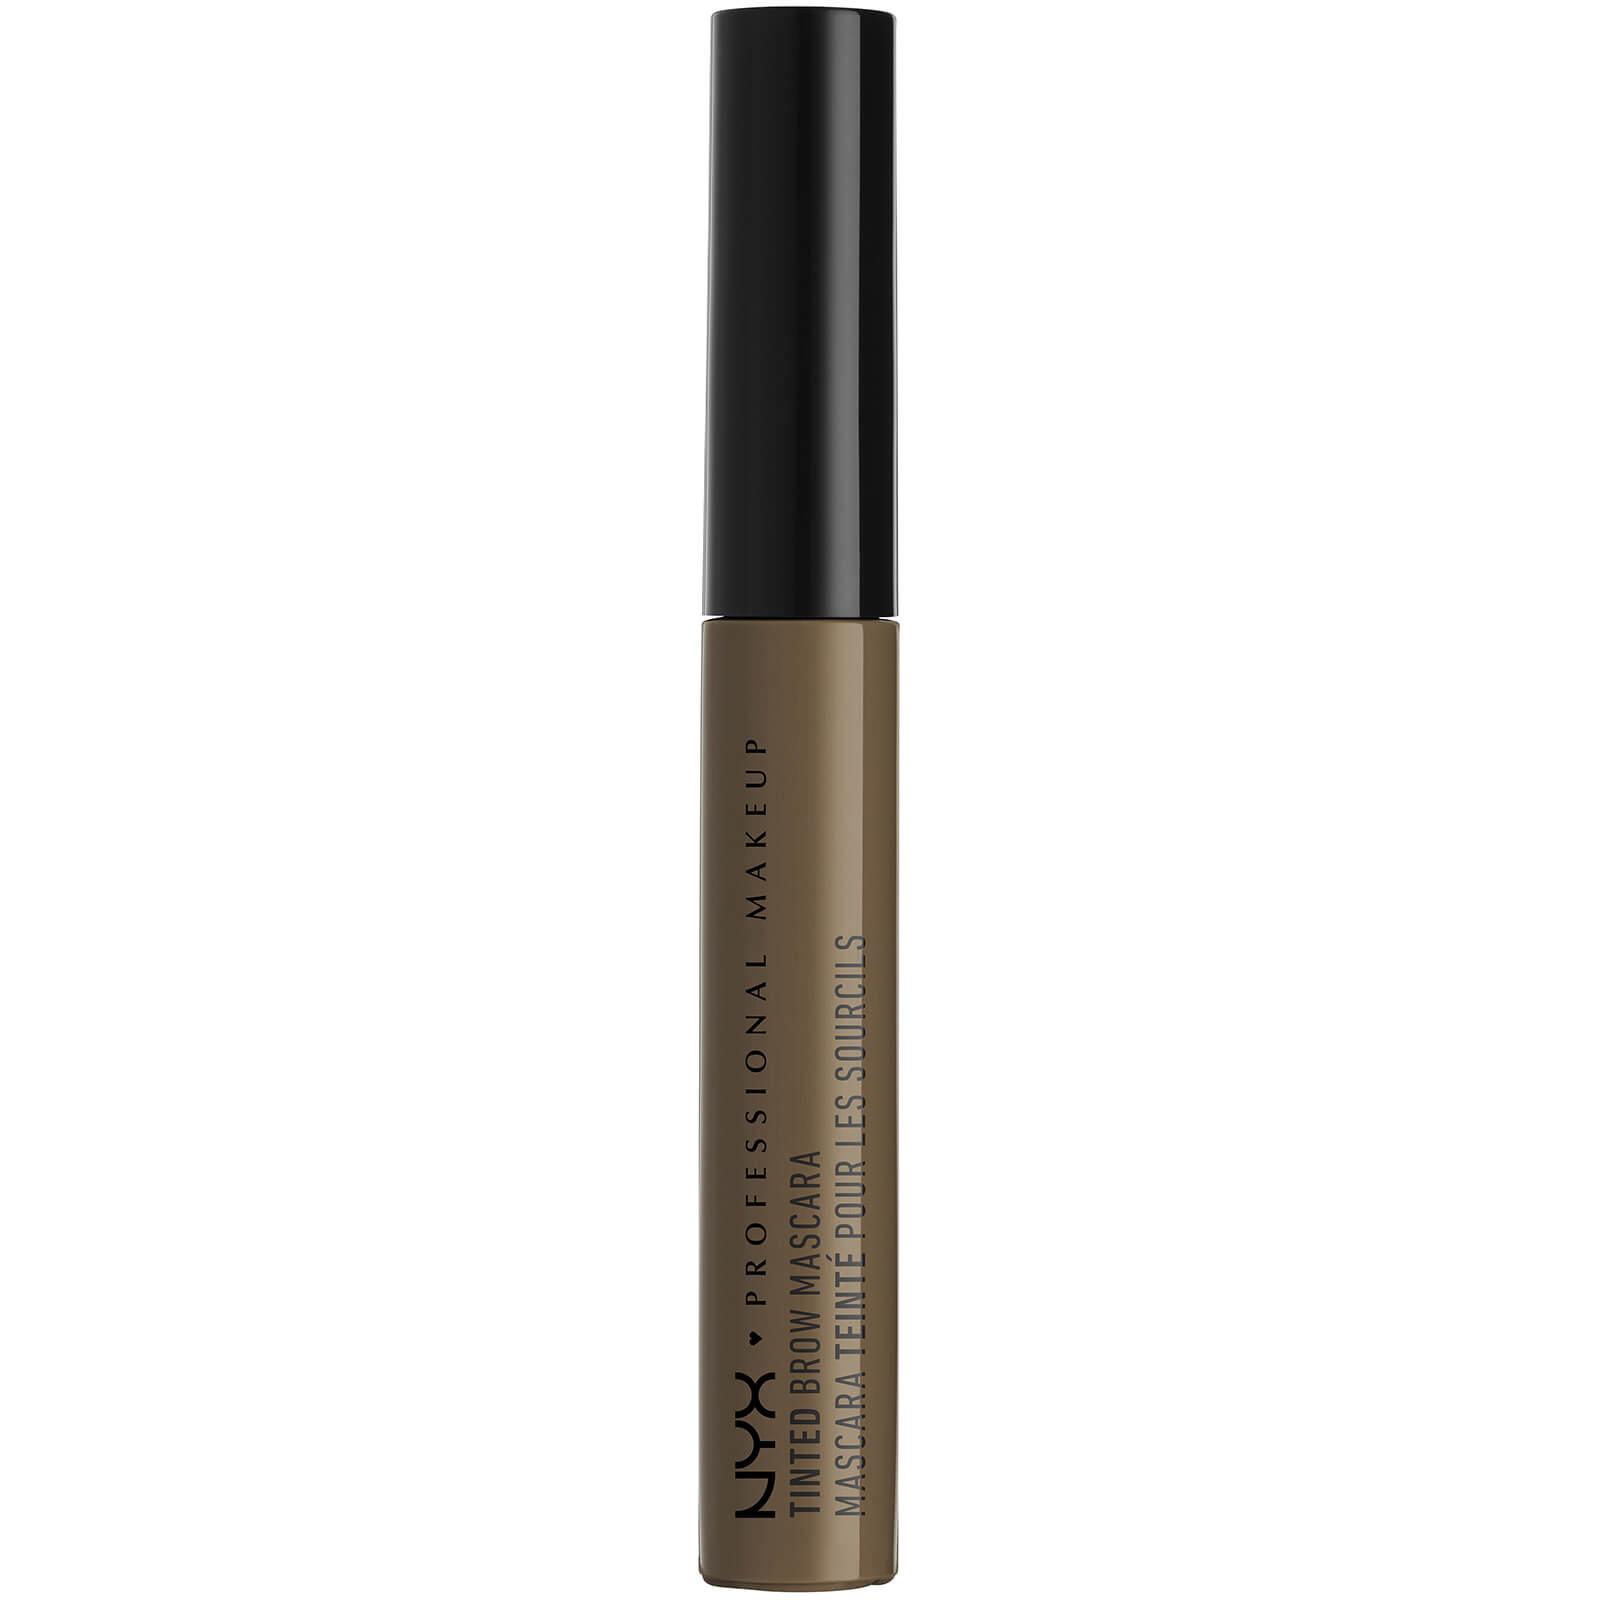 nyx professional makeup tinted brow mascara (various shades) - brunette